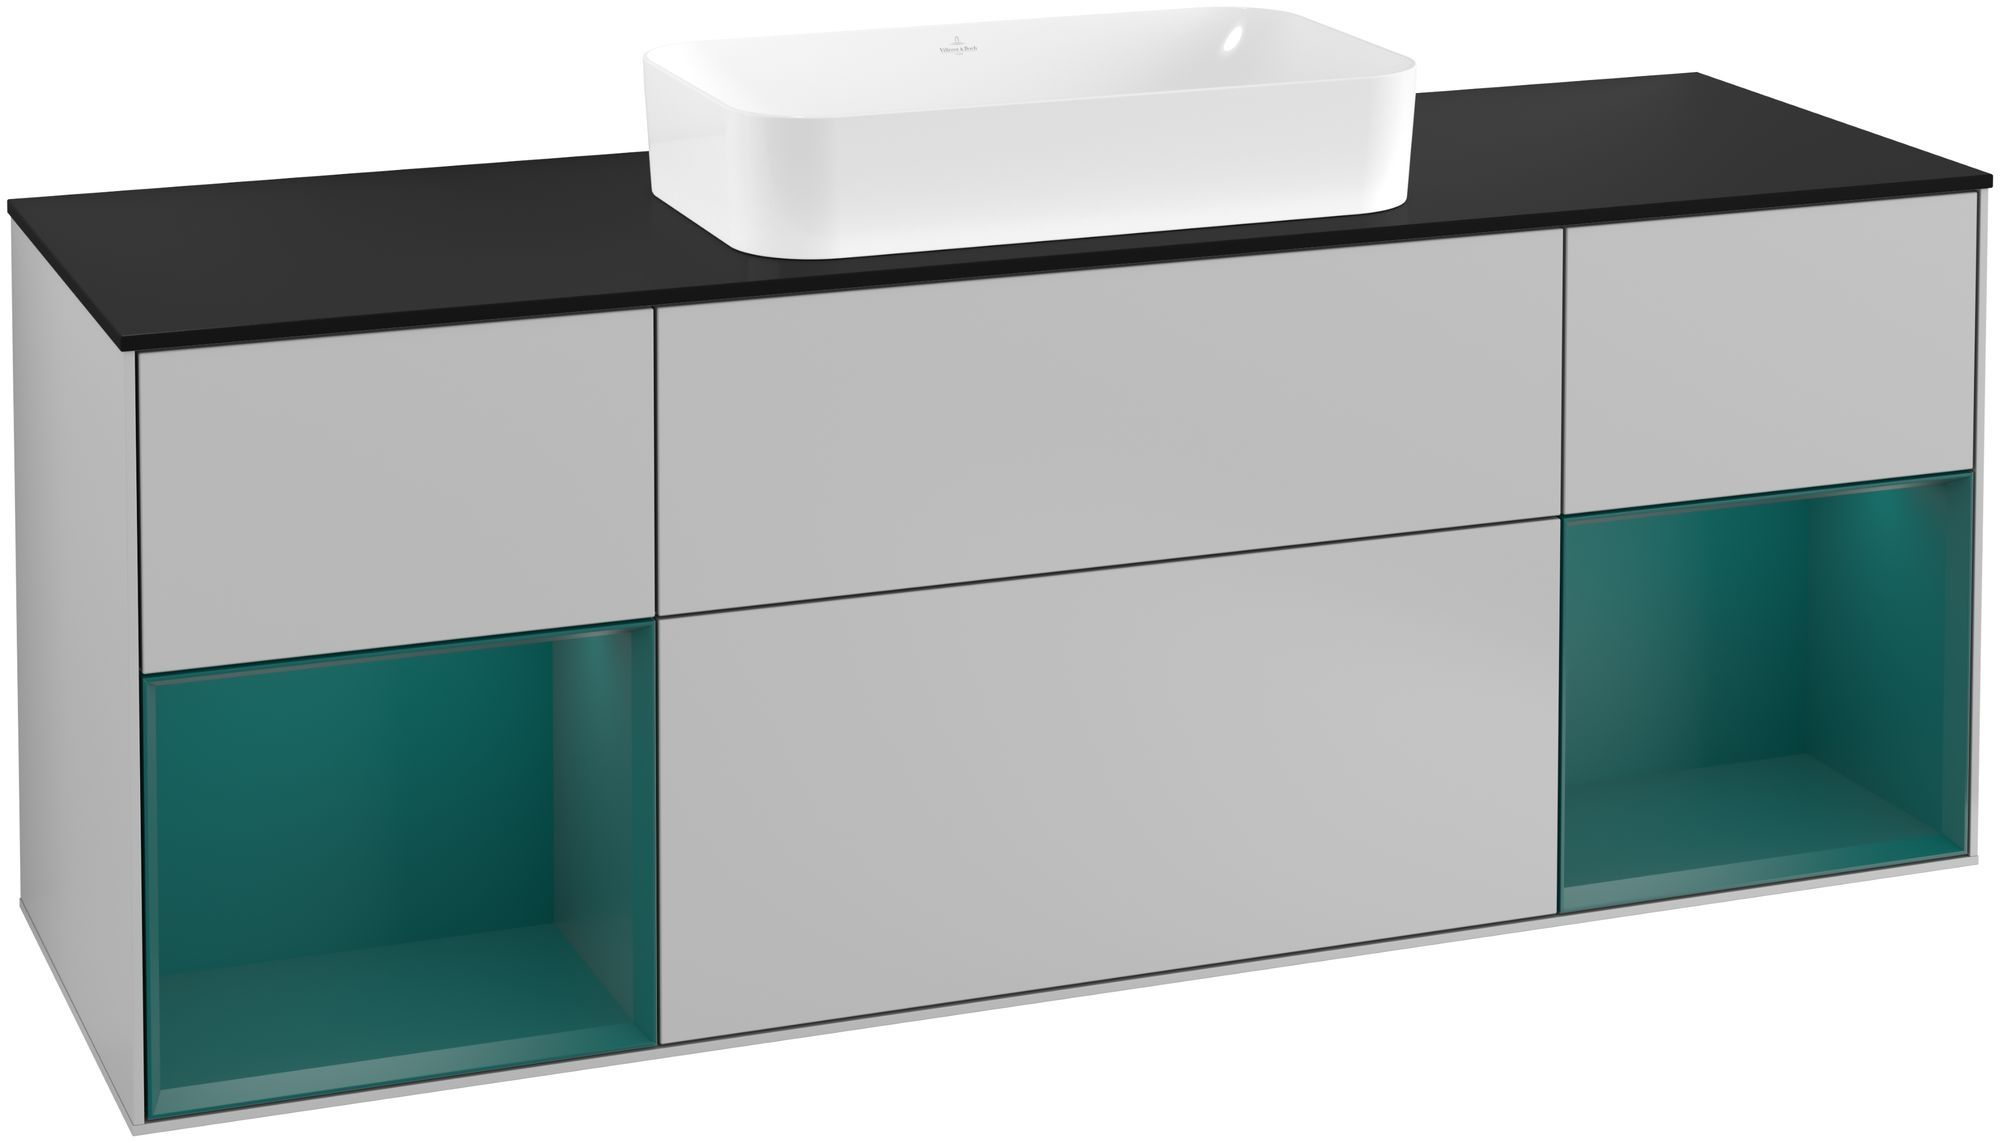 Villeroy & Boch Finion F33 Waschtischunterschrank mit Regalelement 4 Auszüge Waschtisch mittig LED-Beleuchtung B:160xH:60,3xT:50,1cm Front, Korpus: Light Grey Matt, Regal: Cedar, Glasplatte: Black Matt F332GSGJ